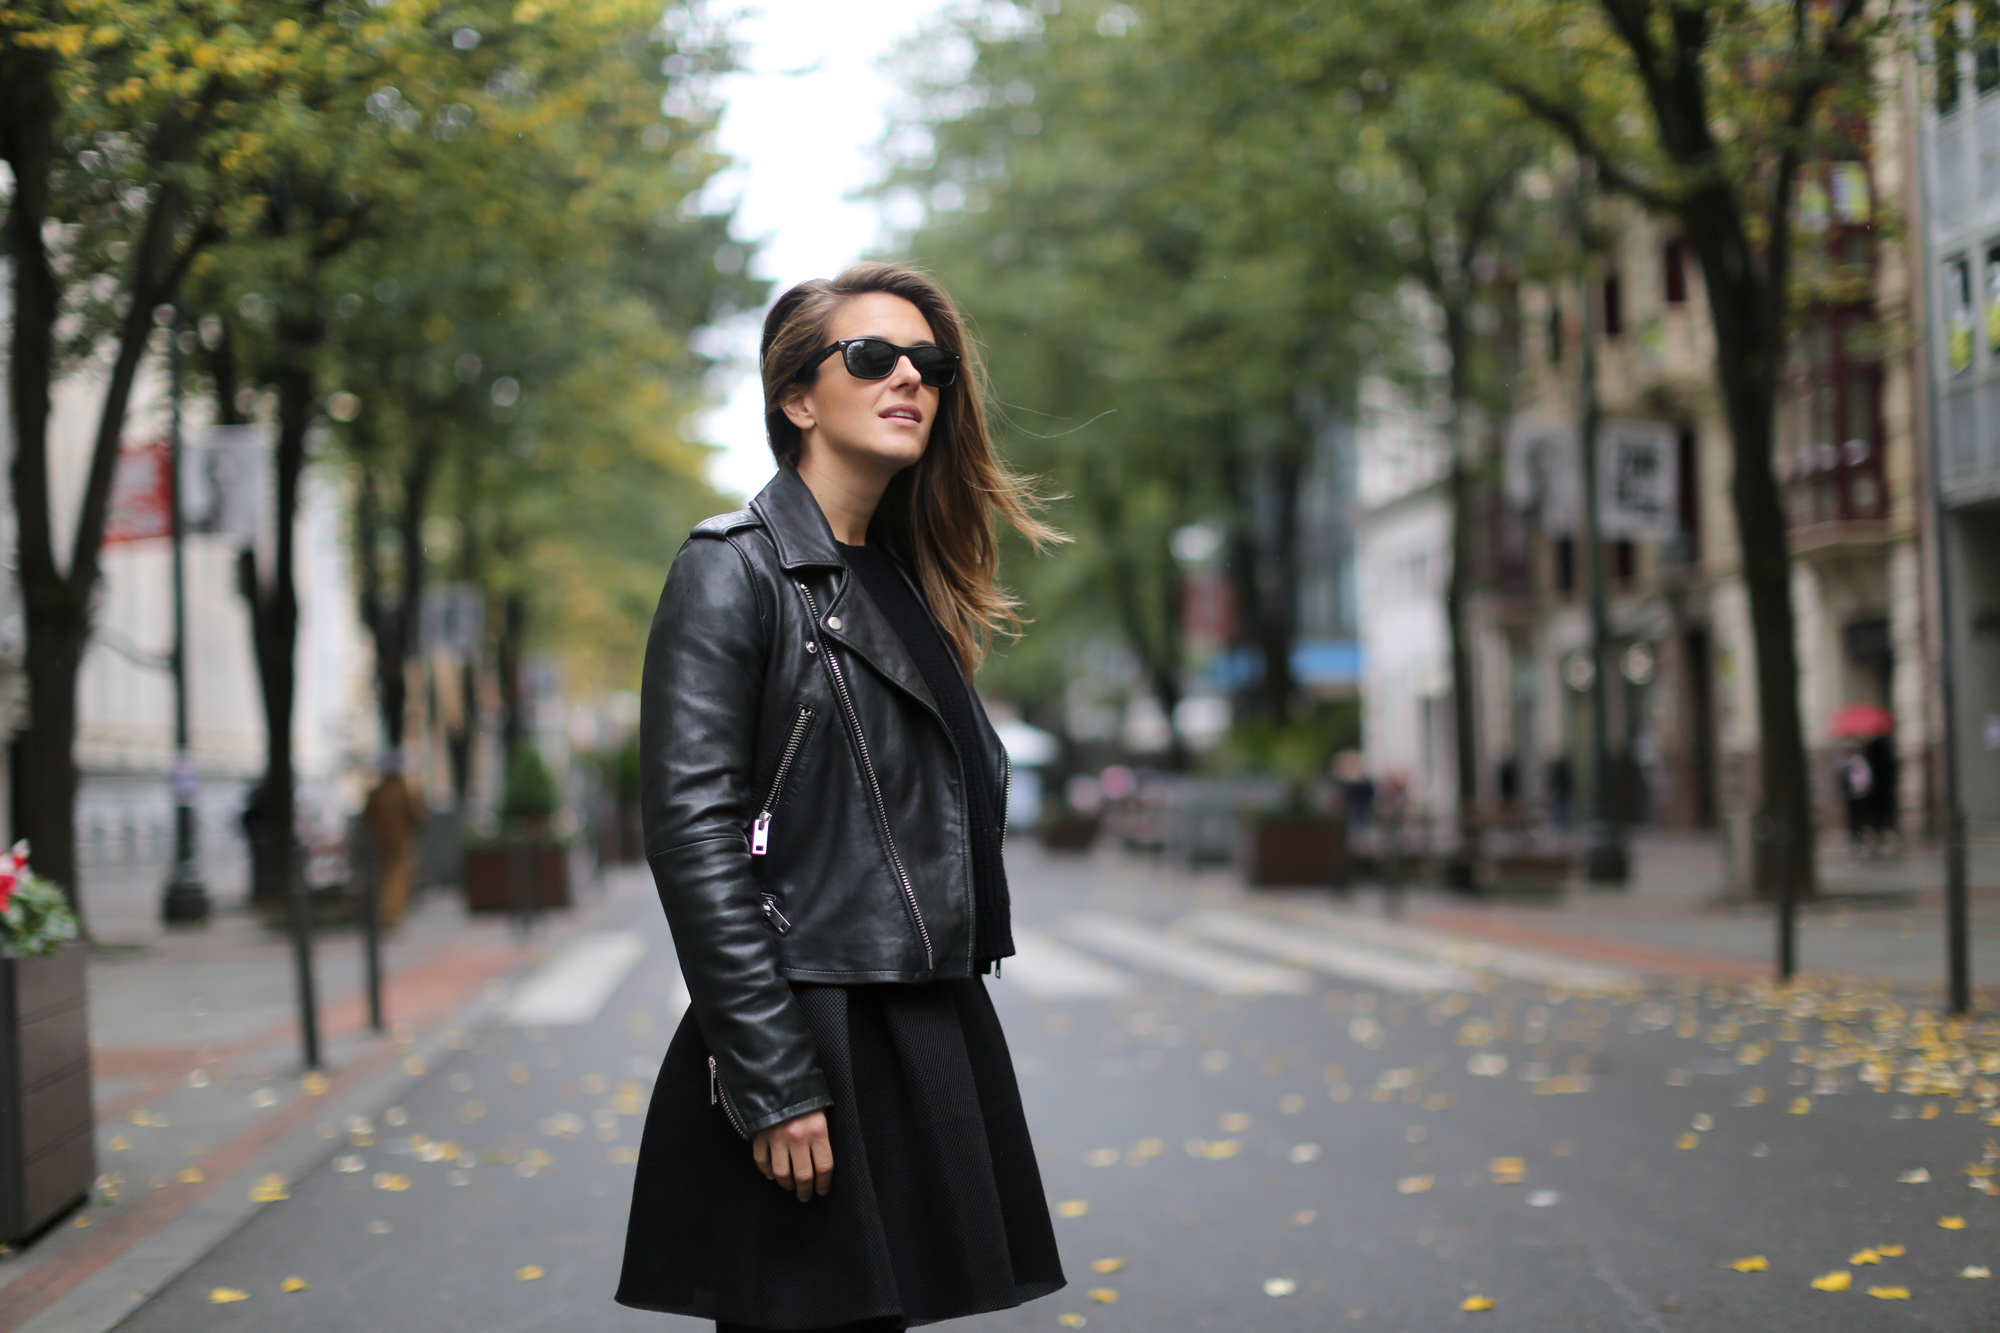 Clochet-streetstyle-mango-leather-biker-jacket-suiteblanco-mesh-skater-skirt-3